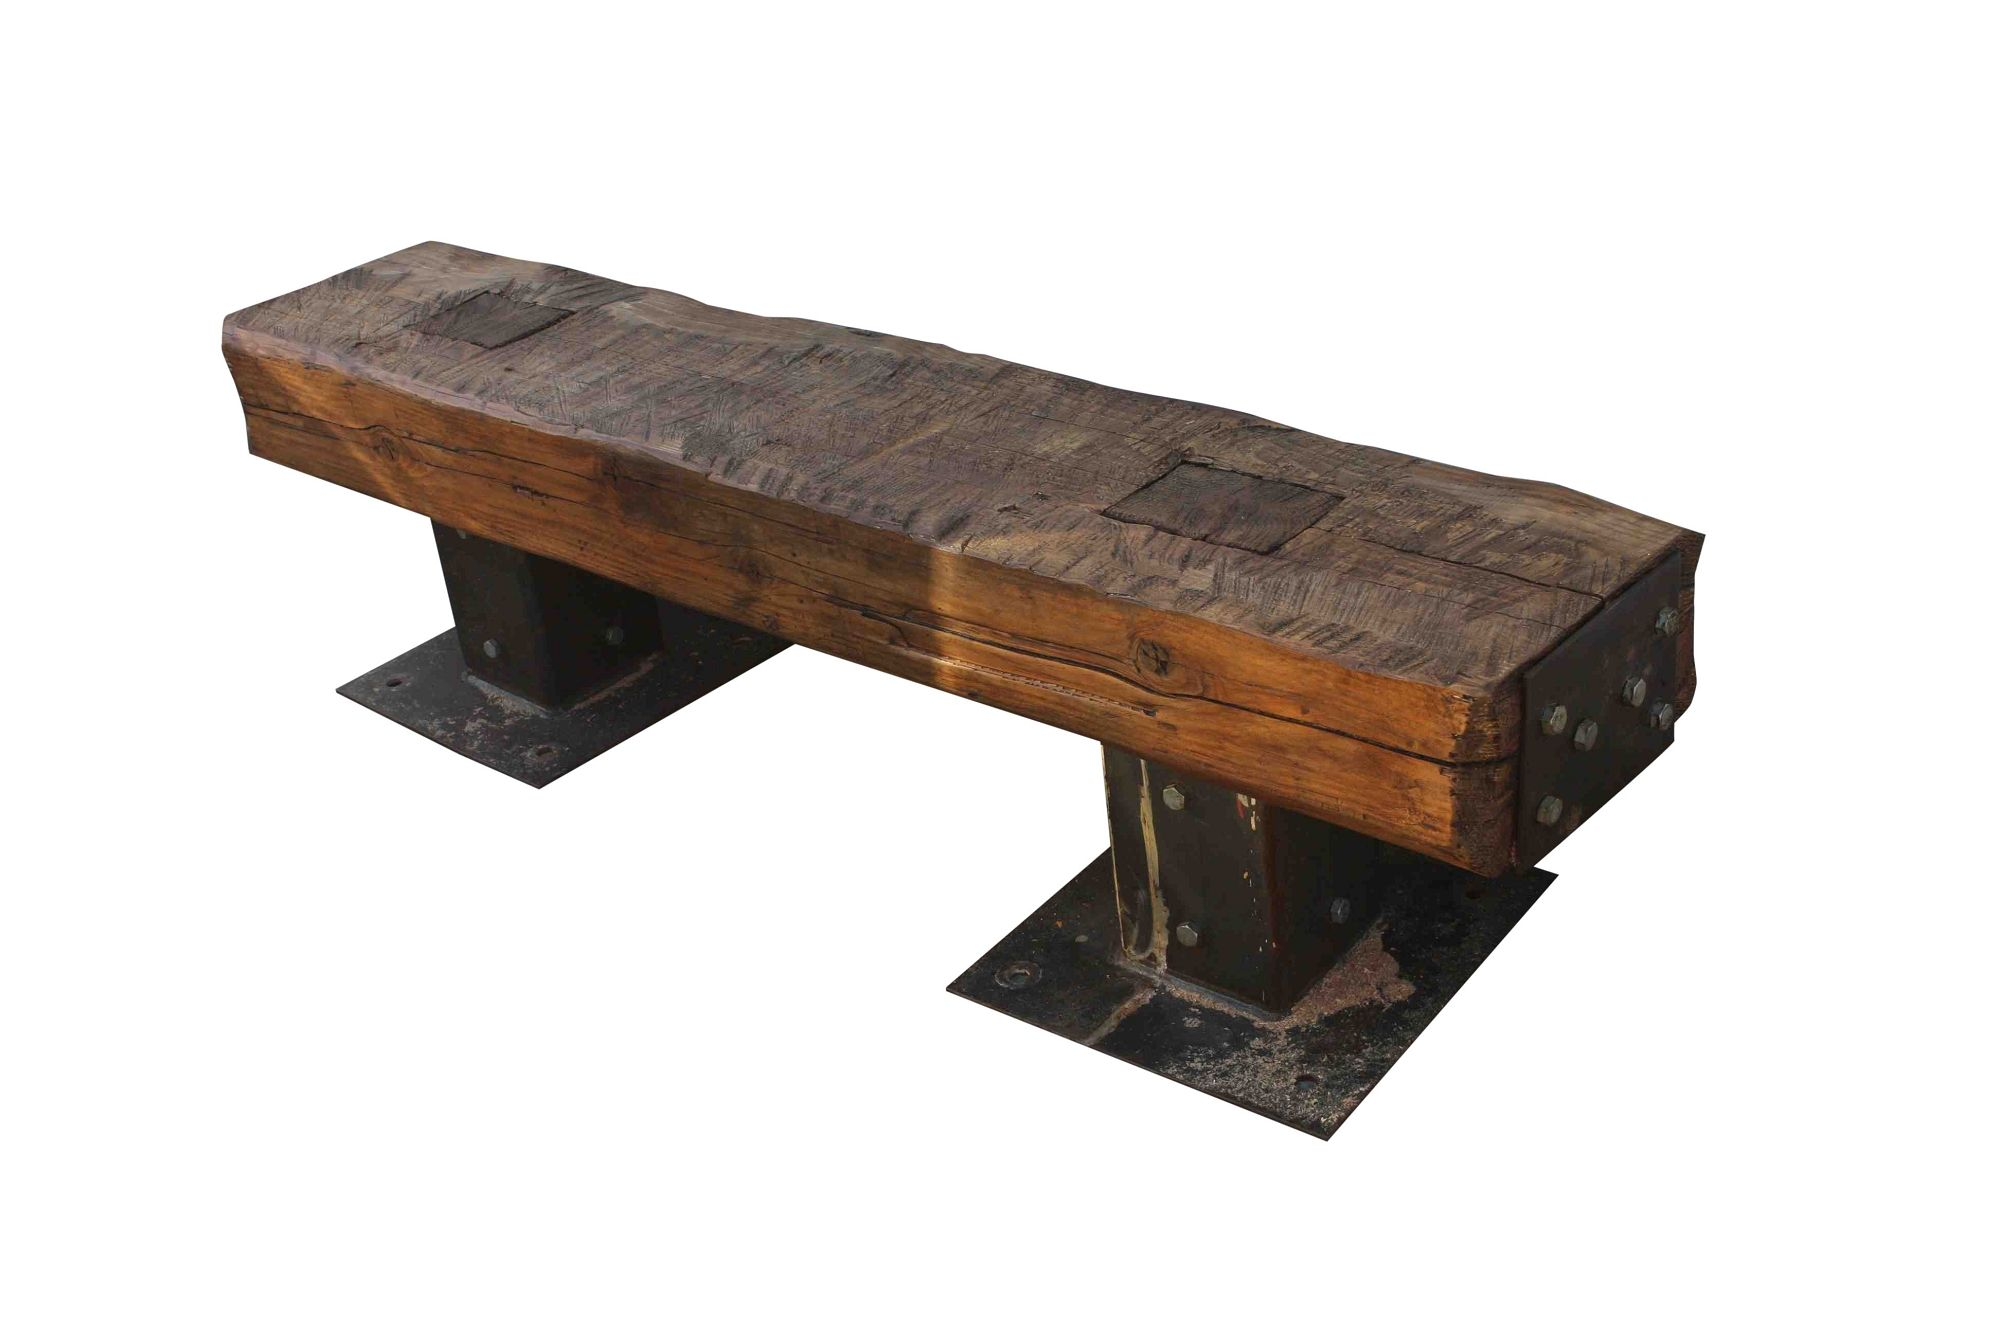 Rustic Wood Outdoor Bench Rustic Wood Bench